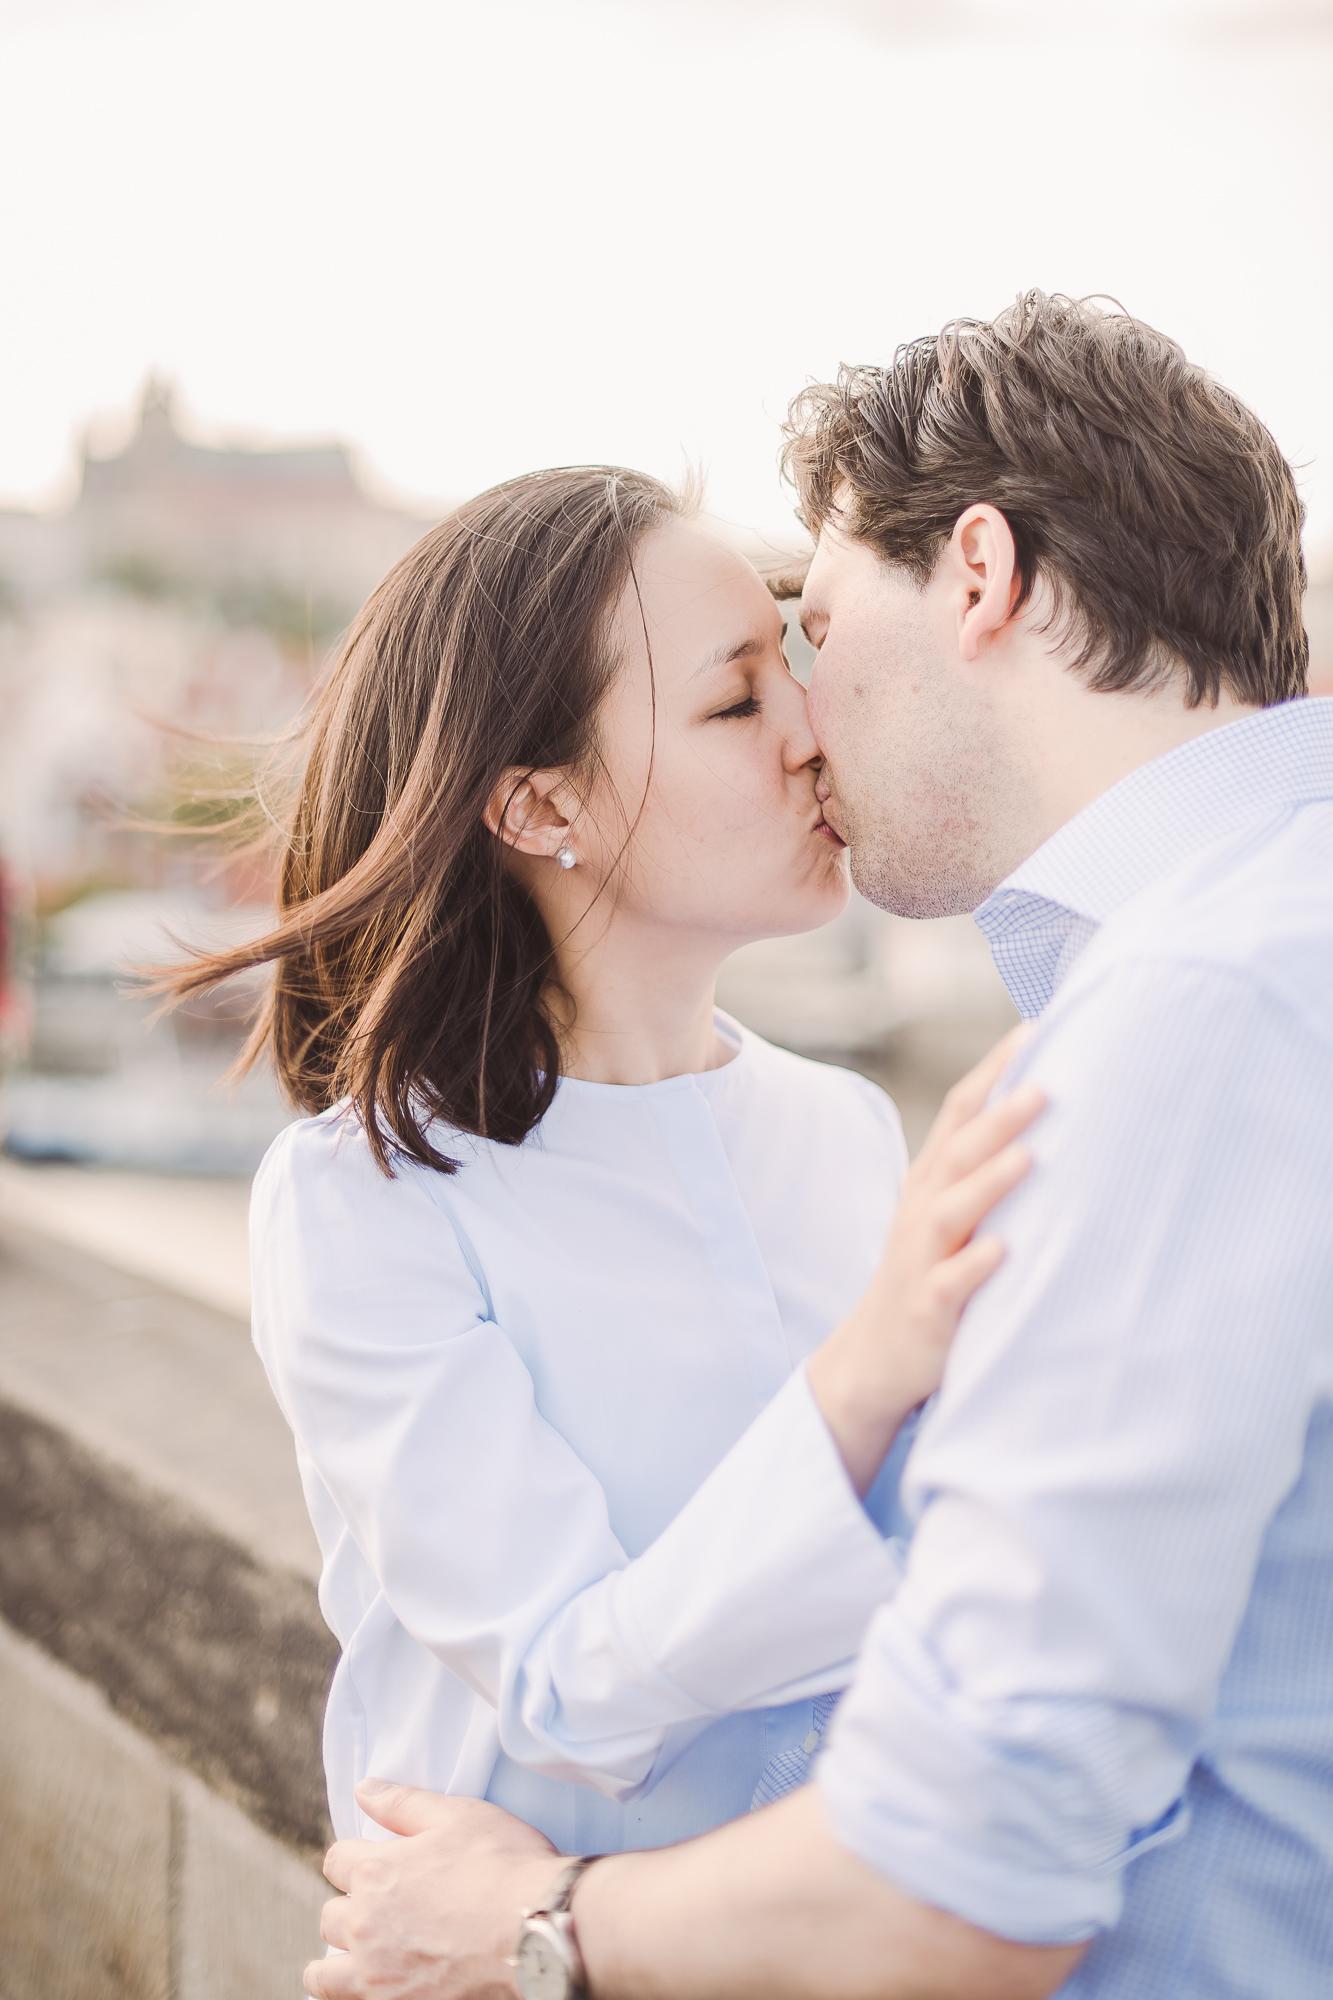 Prague-Wedding-Photography-Matej-Trasak-Engagement-SD-12.jpg